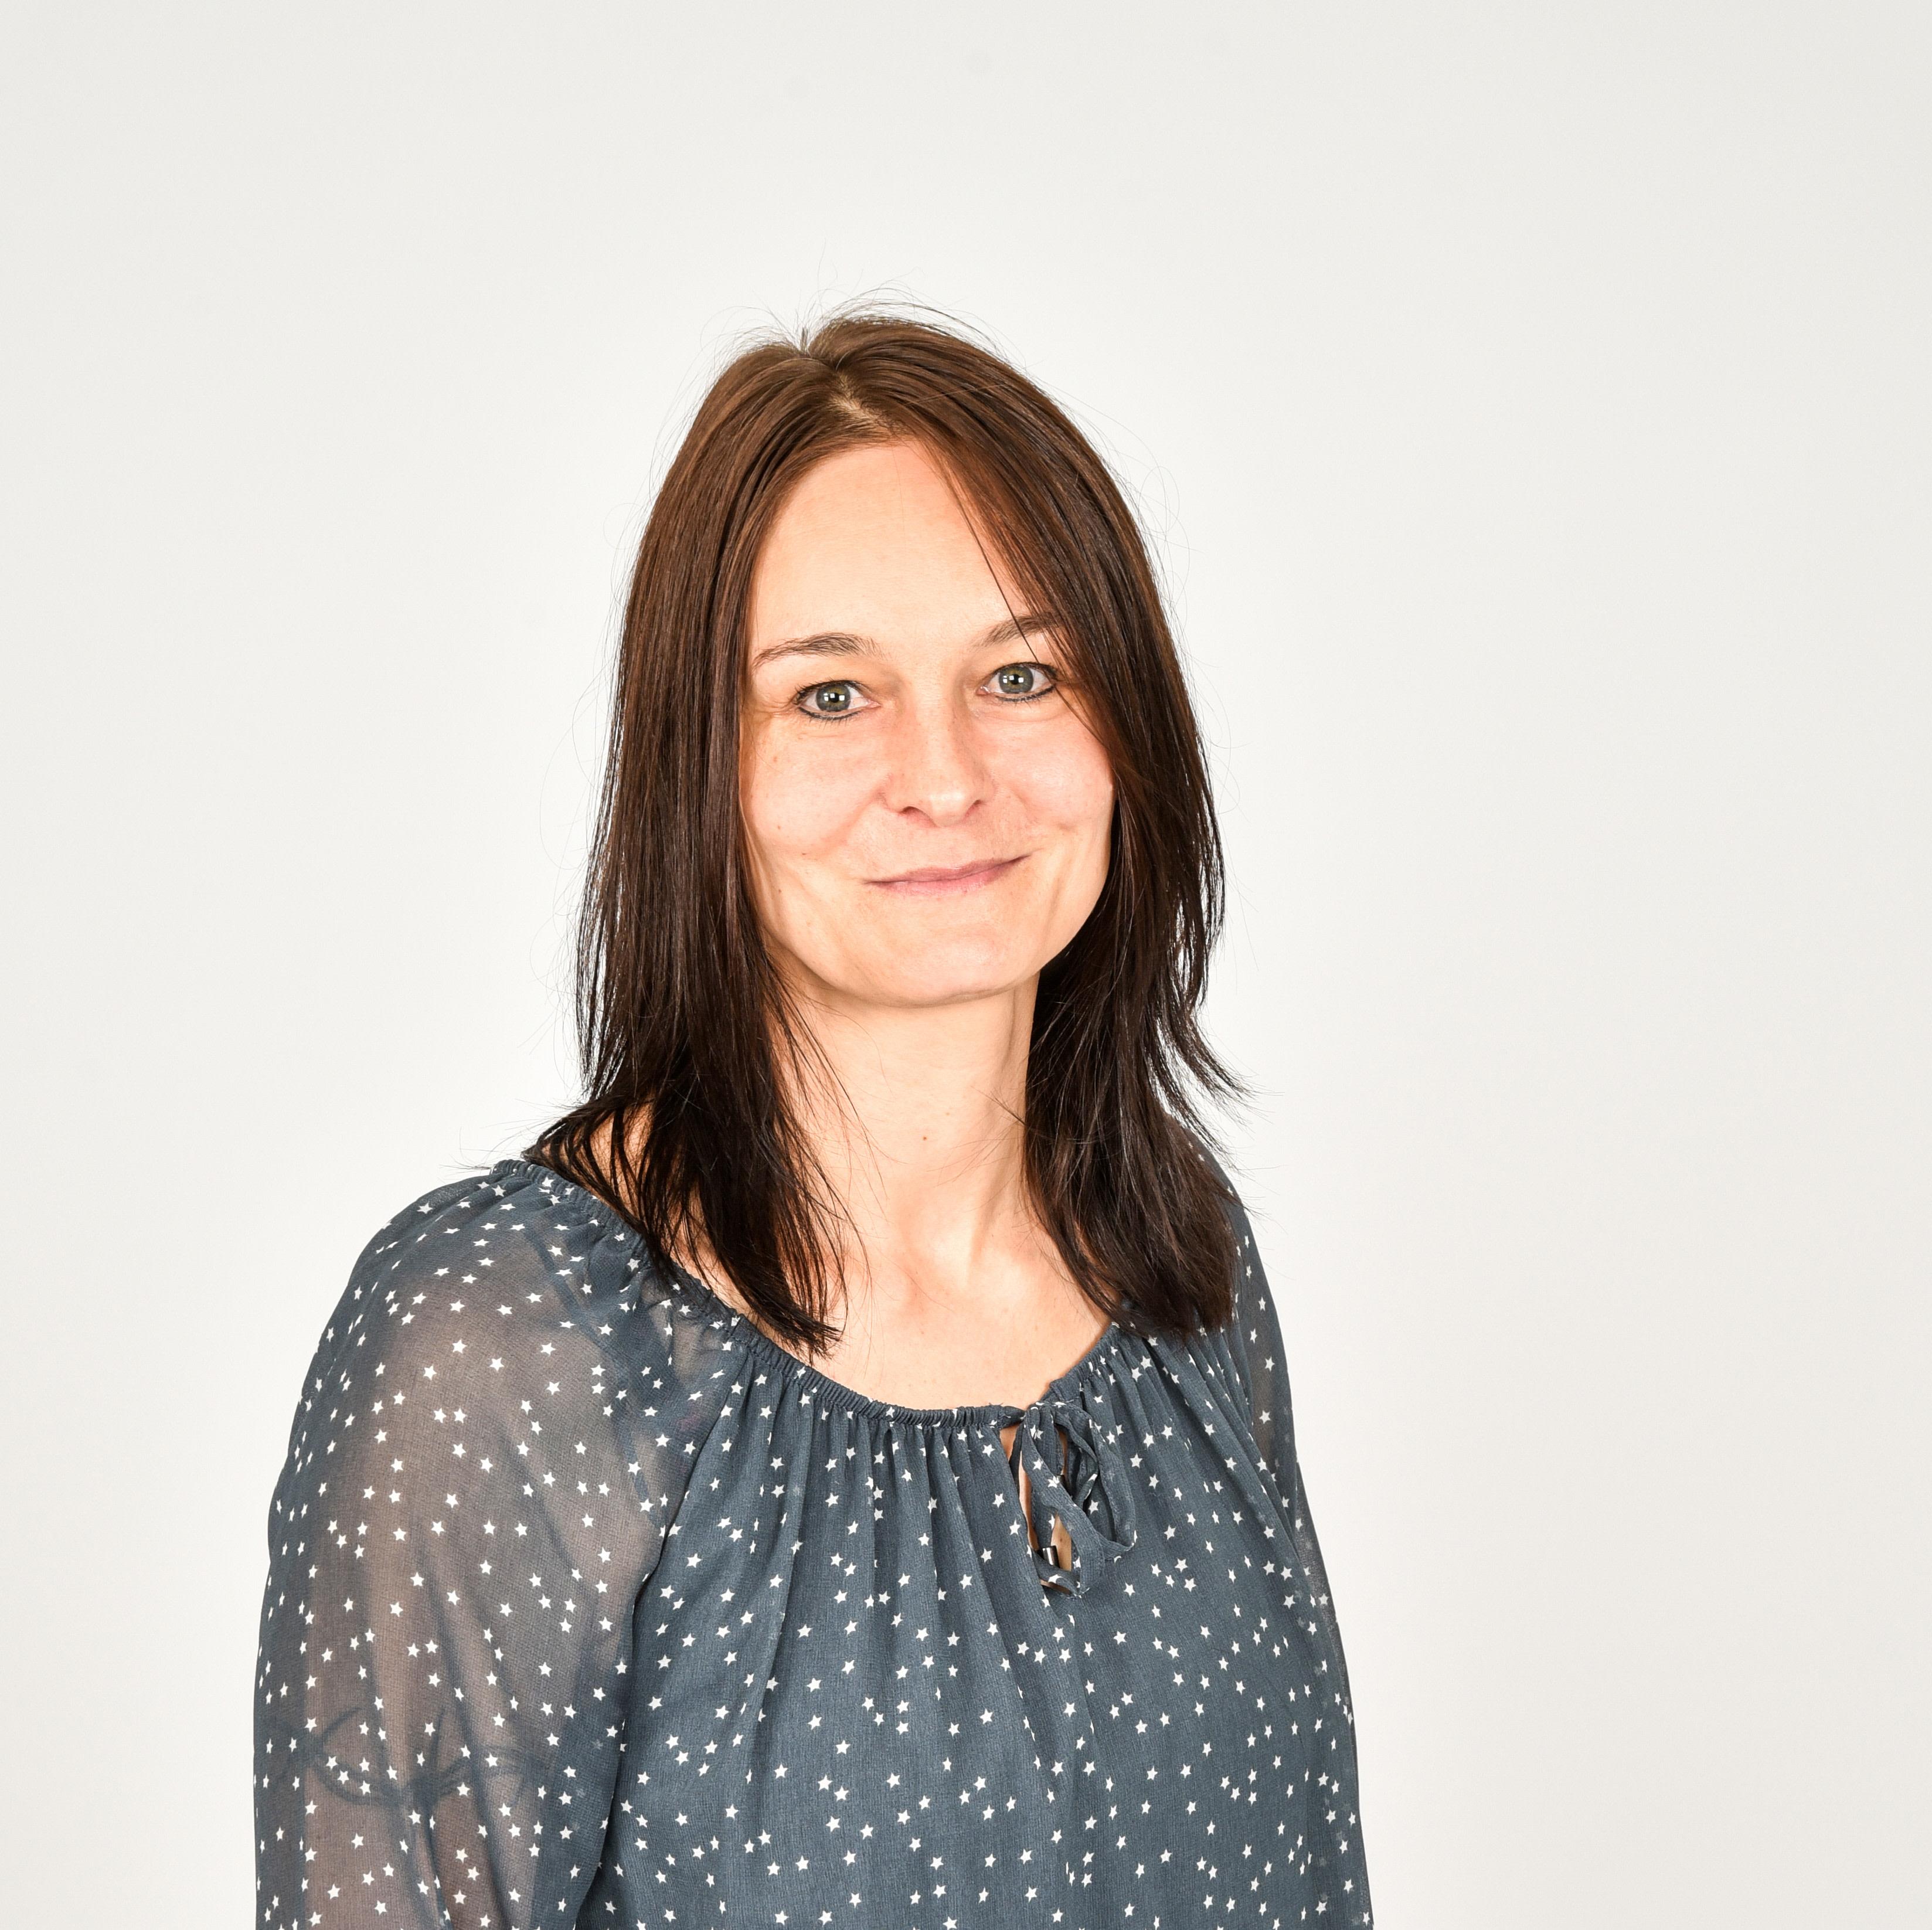 Sandra Hoffmann